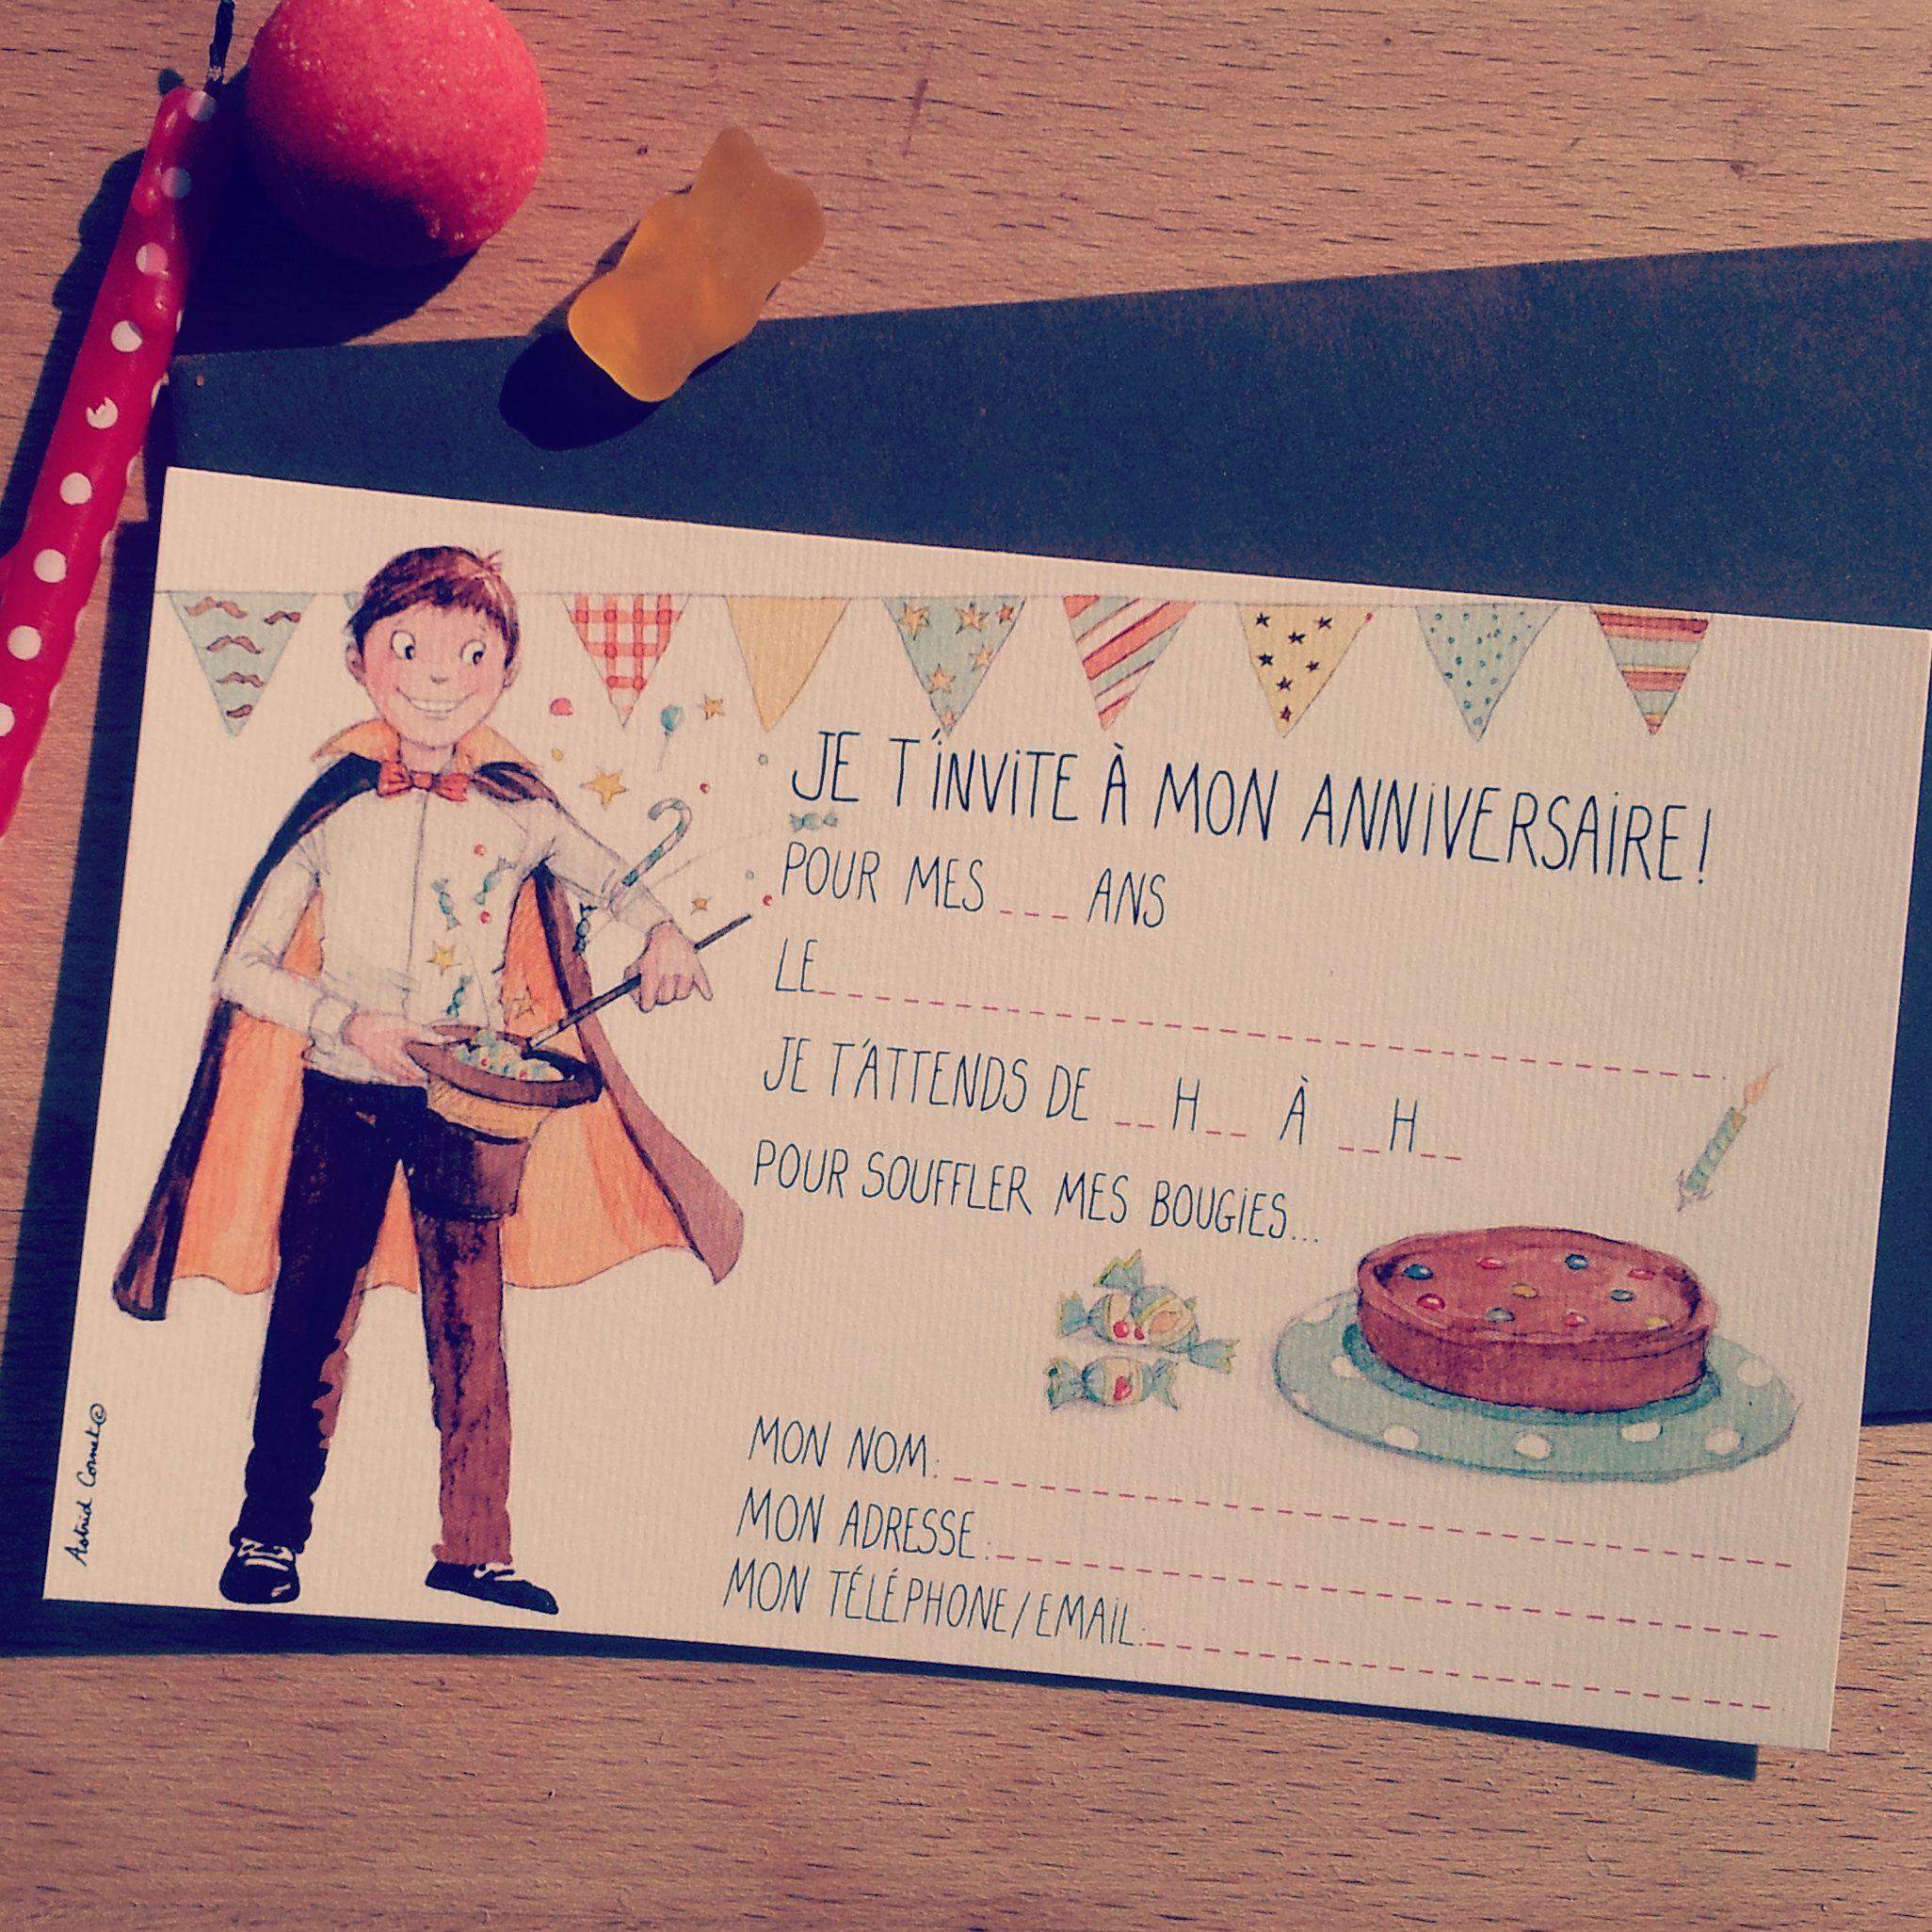 Carte Cartedanniversaire Birthday Birthdaycard Gateaux Bonbons Illustration Illustrationpesronnalis Carte Anniversaire Anniversaire Anniversaire Enfant